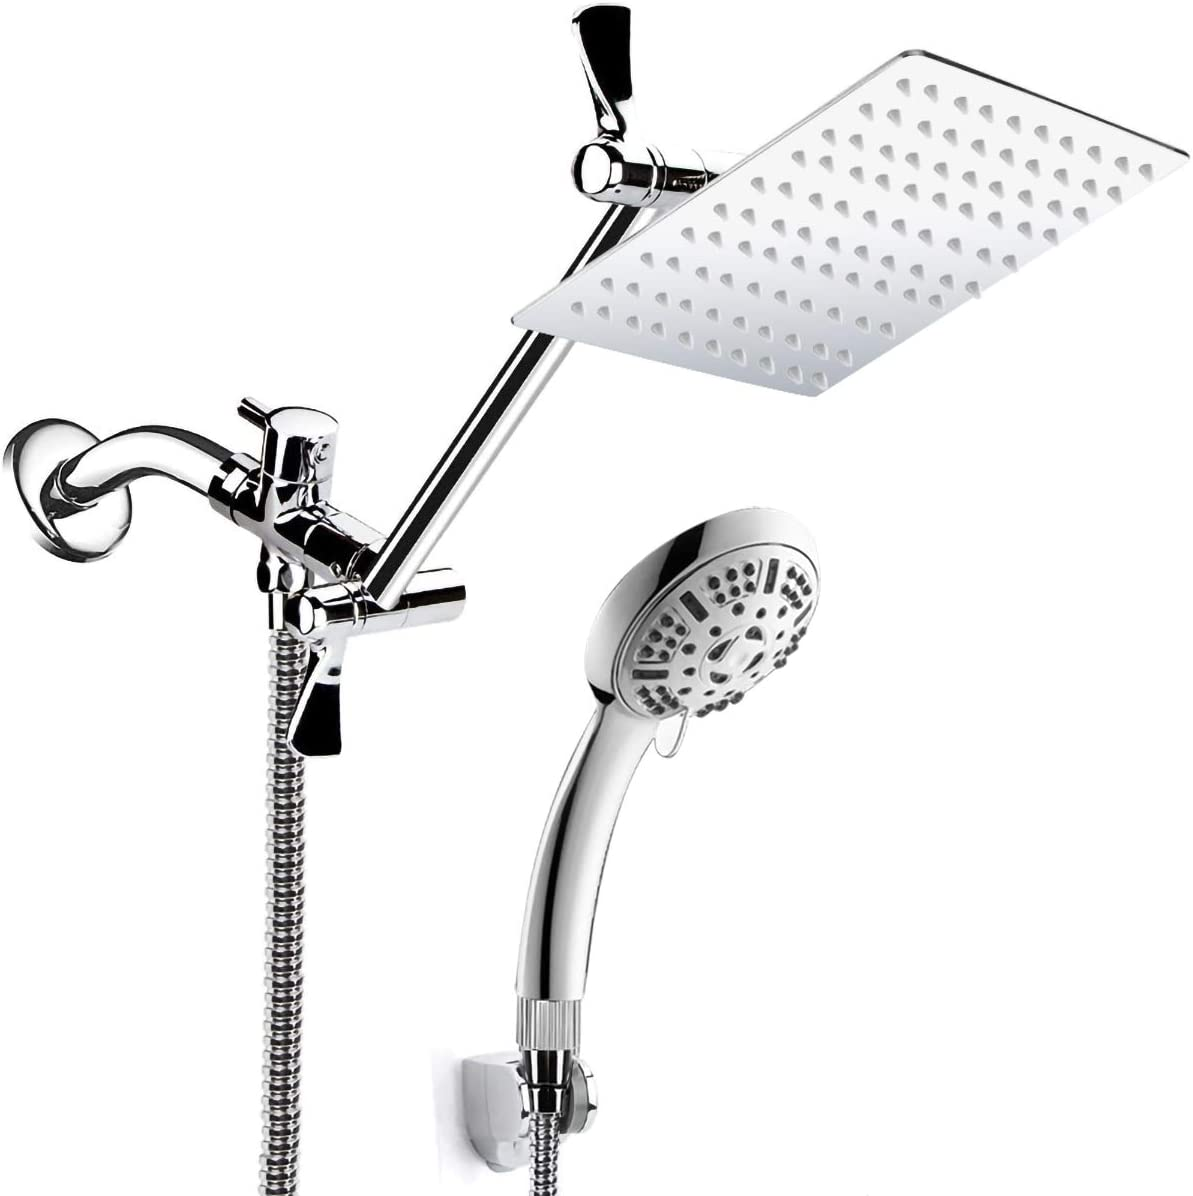 Buy Shower Head Combo, 20'' High Pressure Rain Shower Head with 20 ...